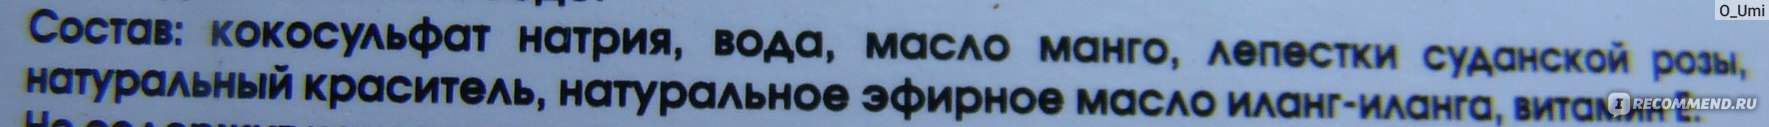 "Твердый шампунь Meela Meelo ""Суданская роза"". фото"